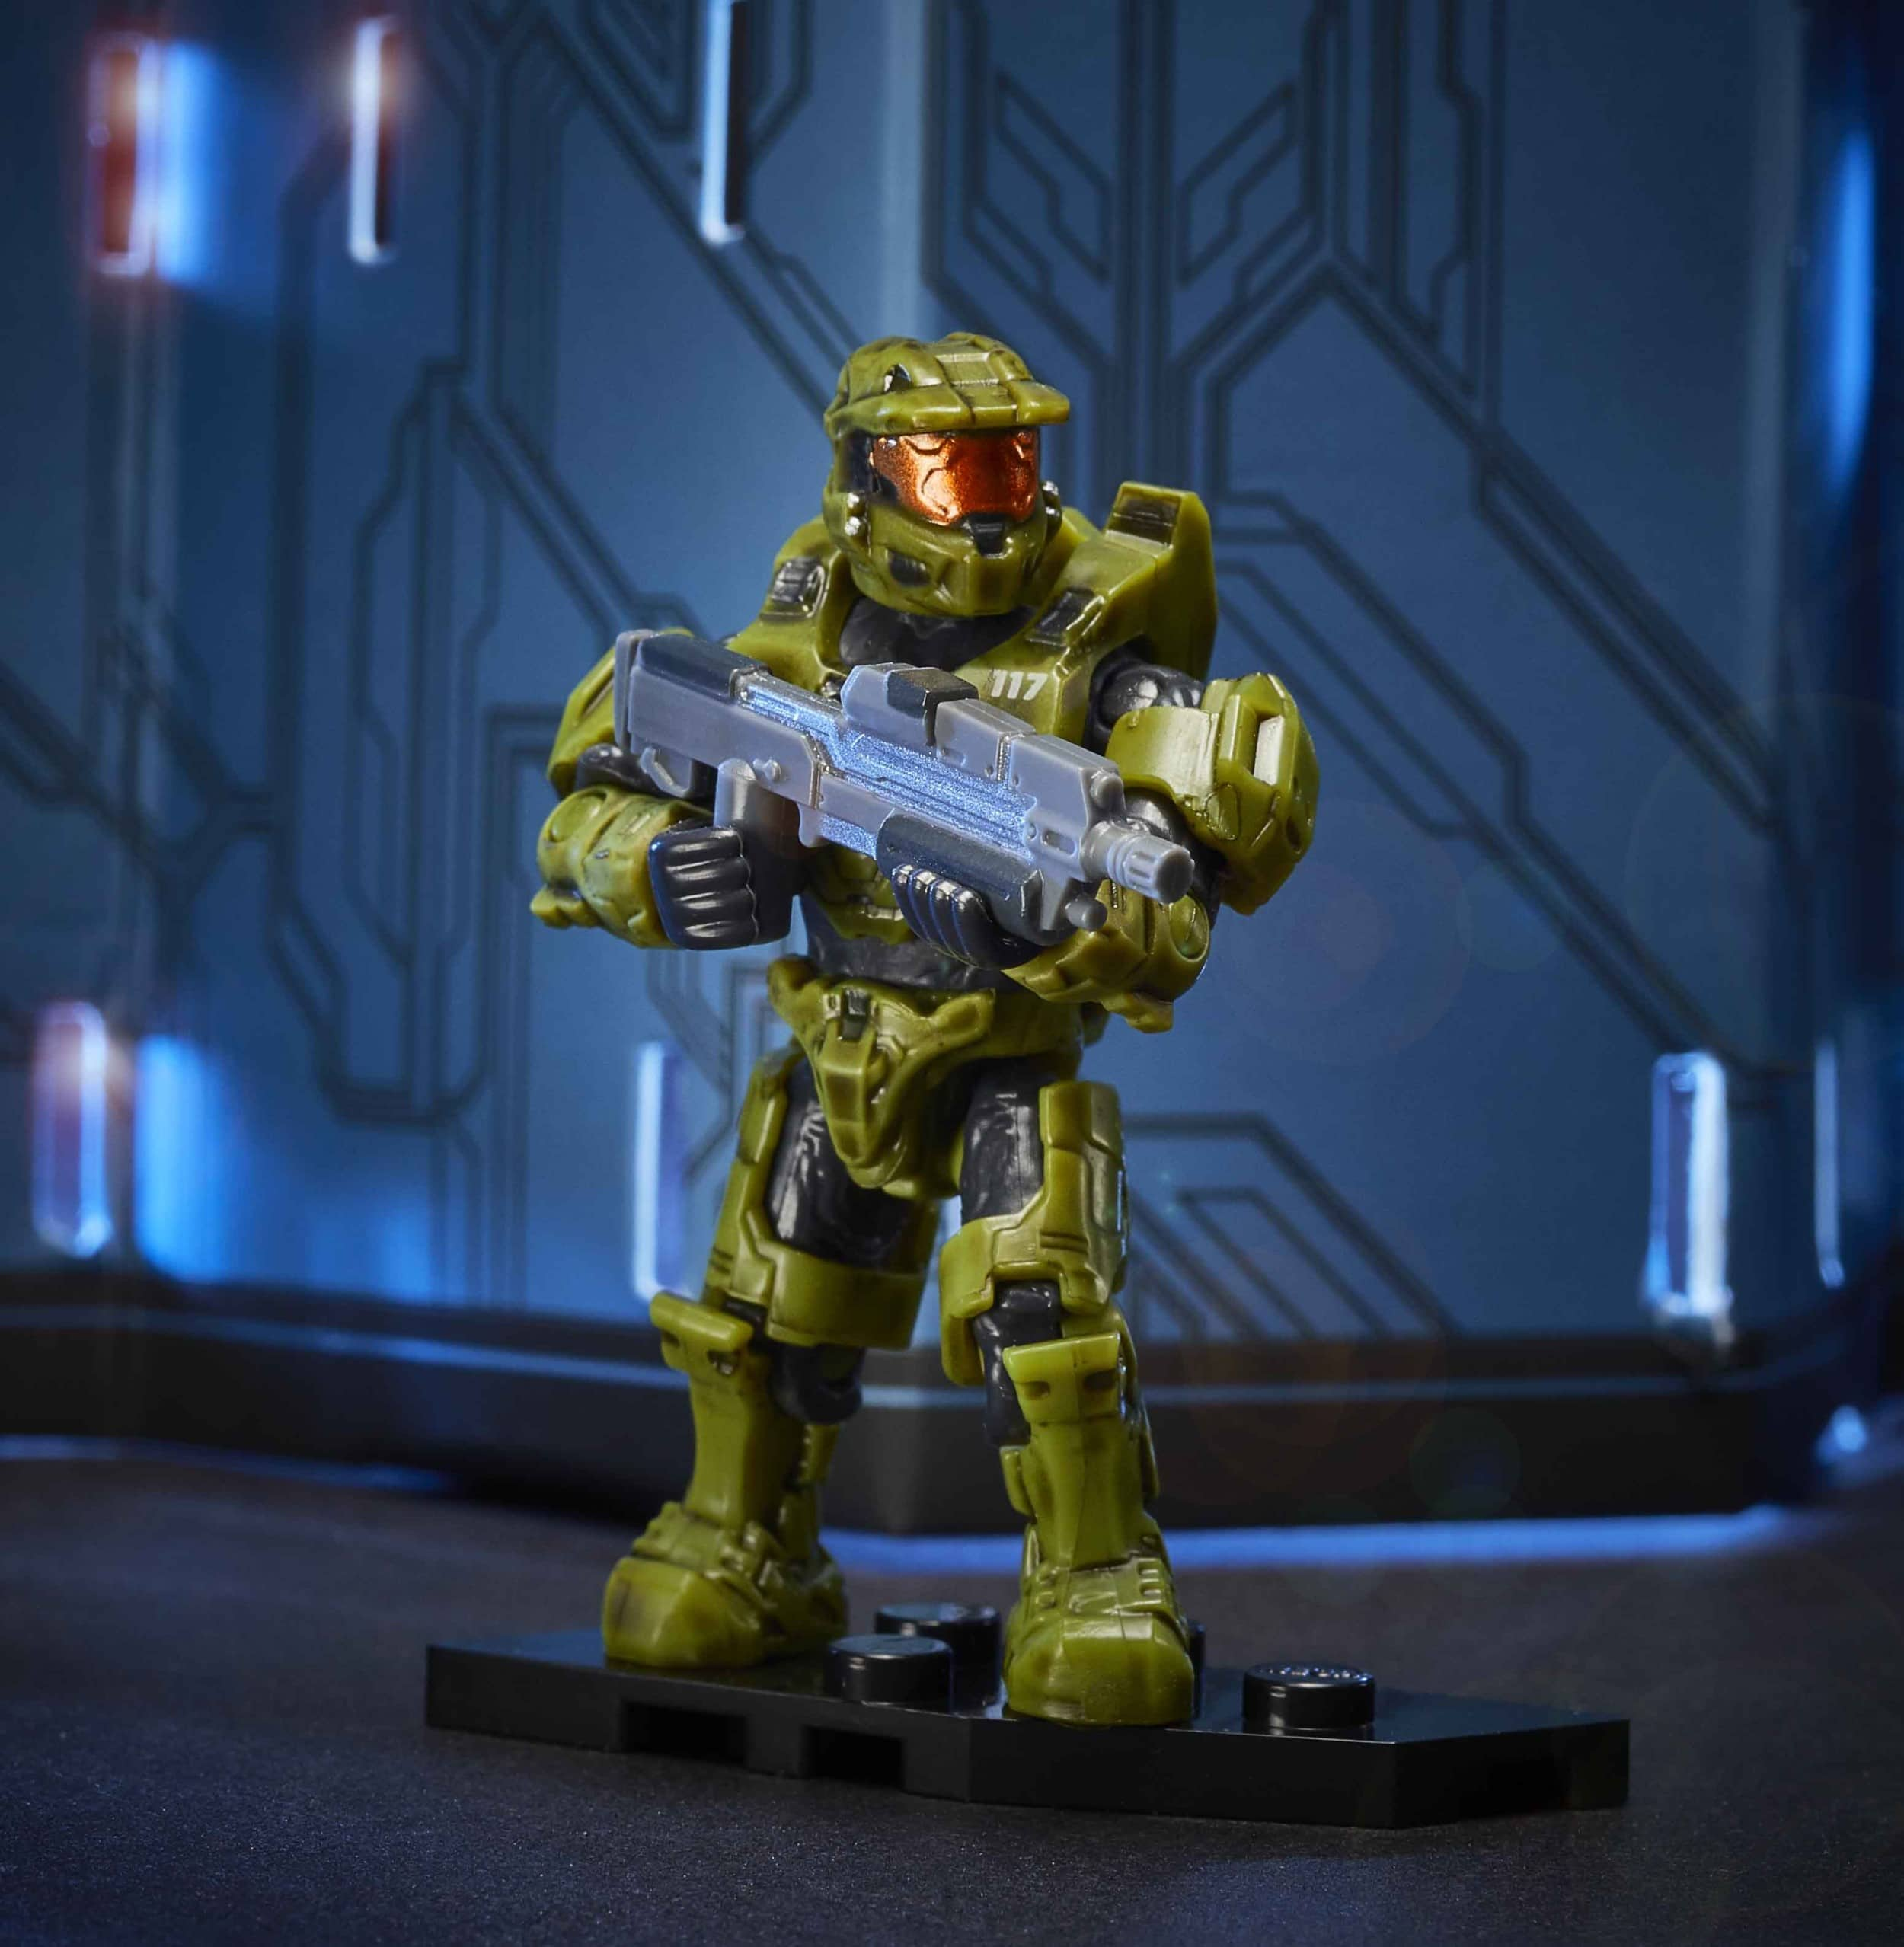 MEGA Construx reveals Halo Master Chief Collection as a Comic-Con exclusive 16